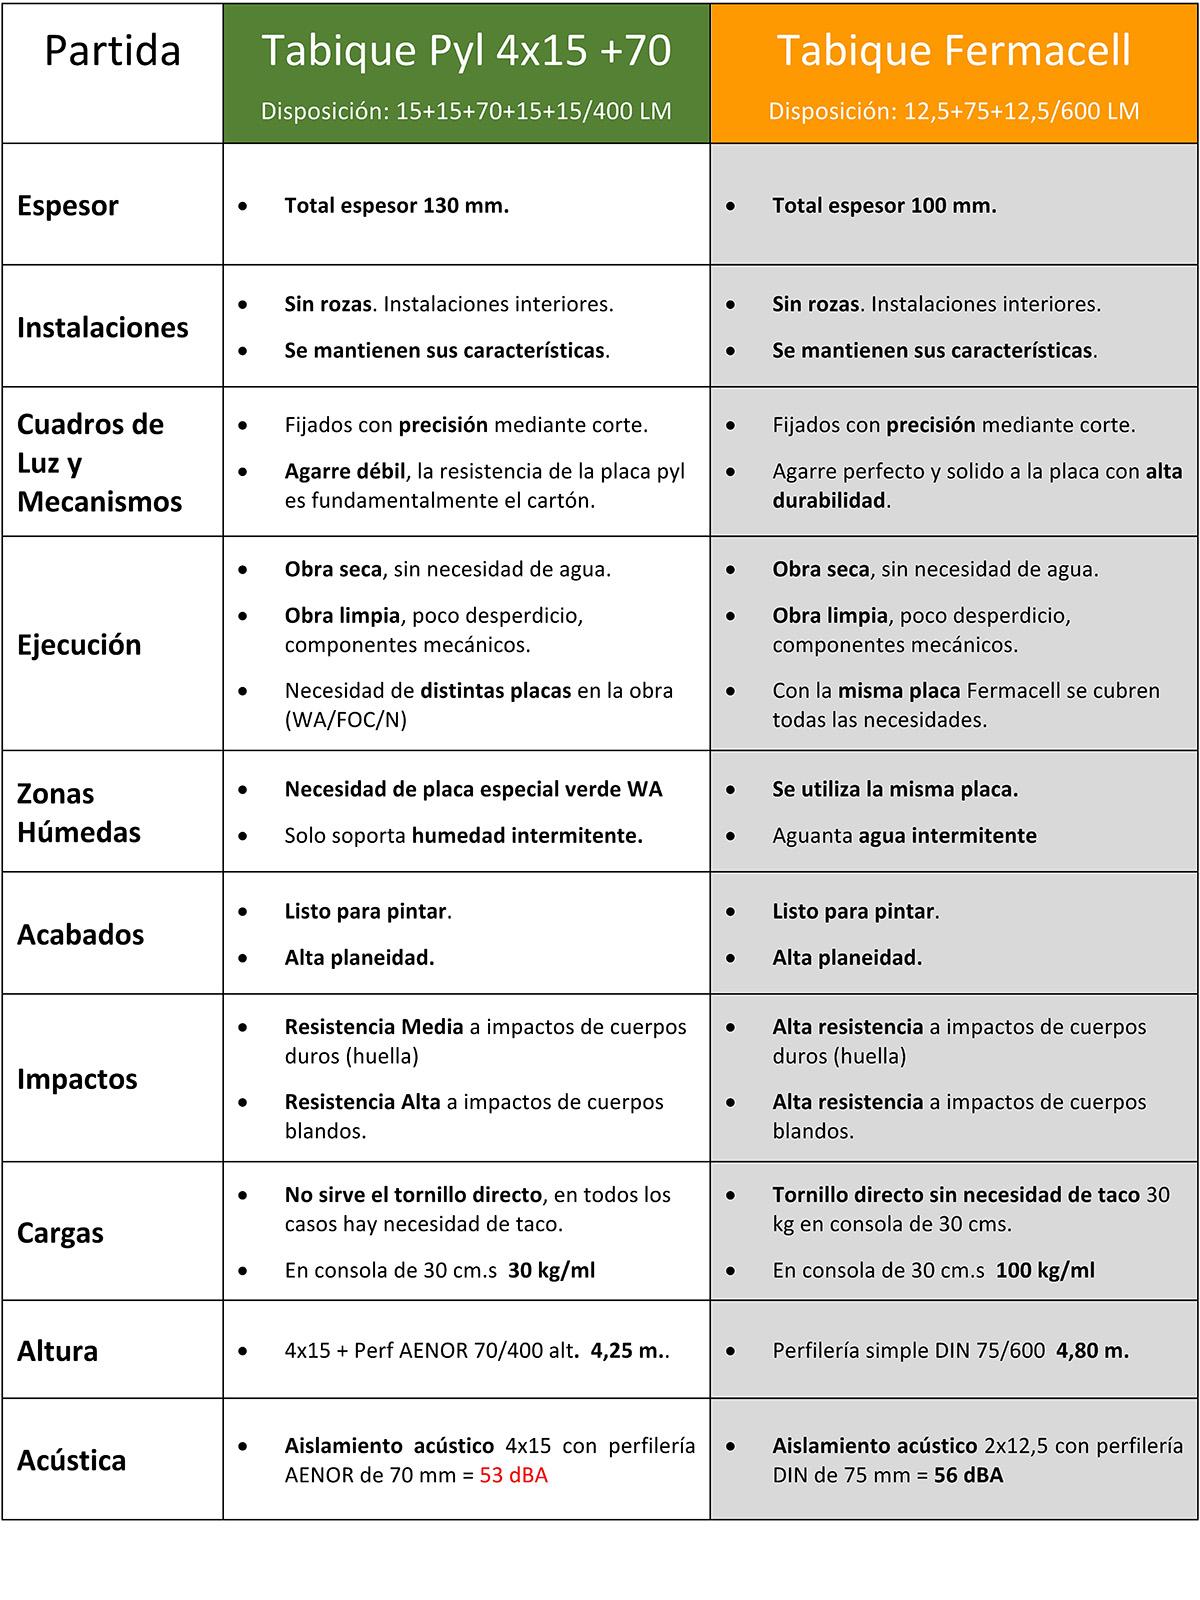 tabique cartón-yeso espesor 130 mm vs Fermacell 100 mm